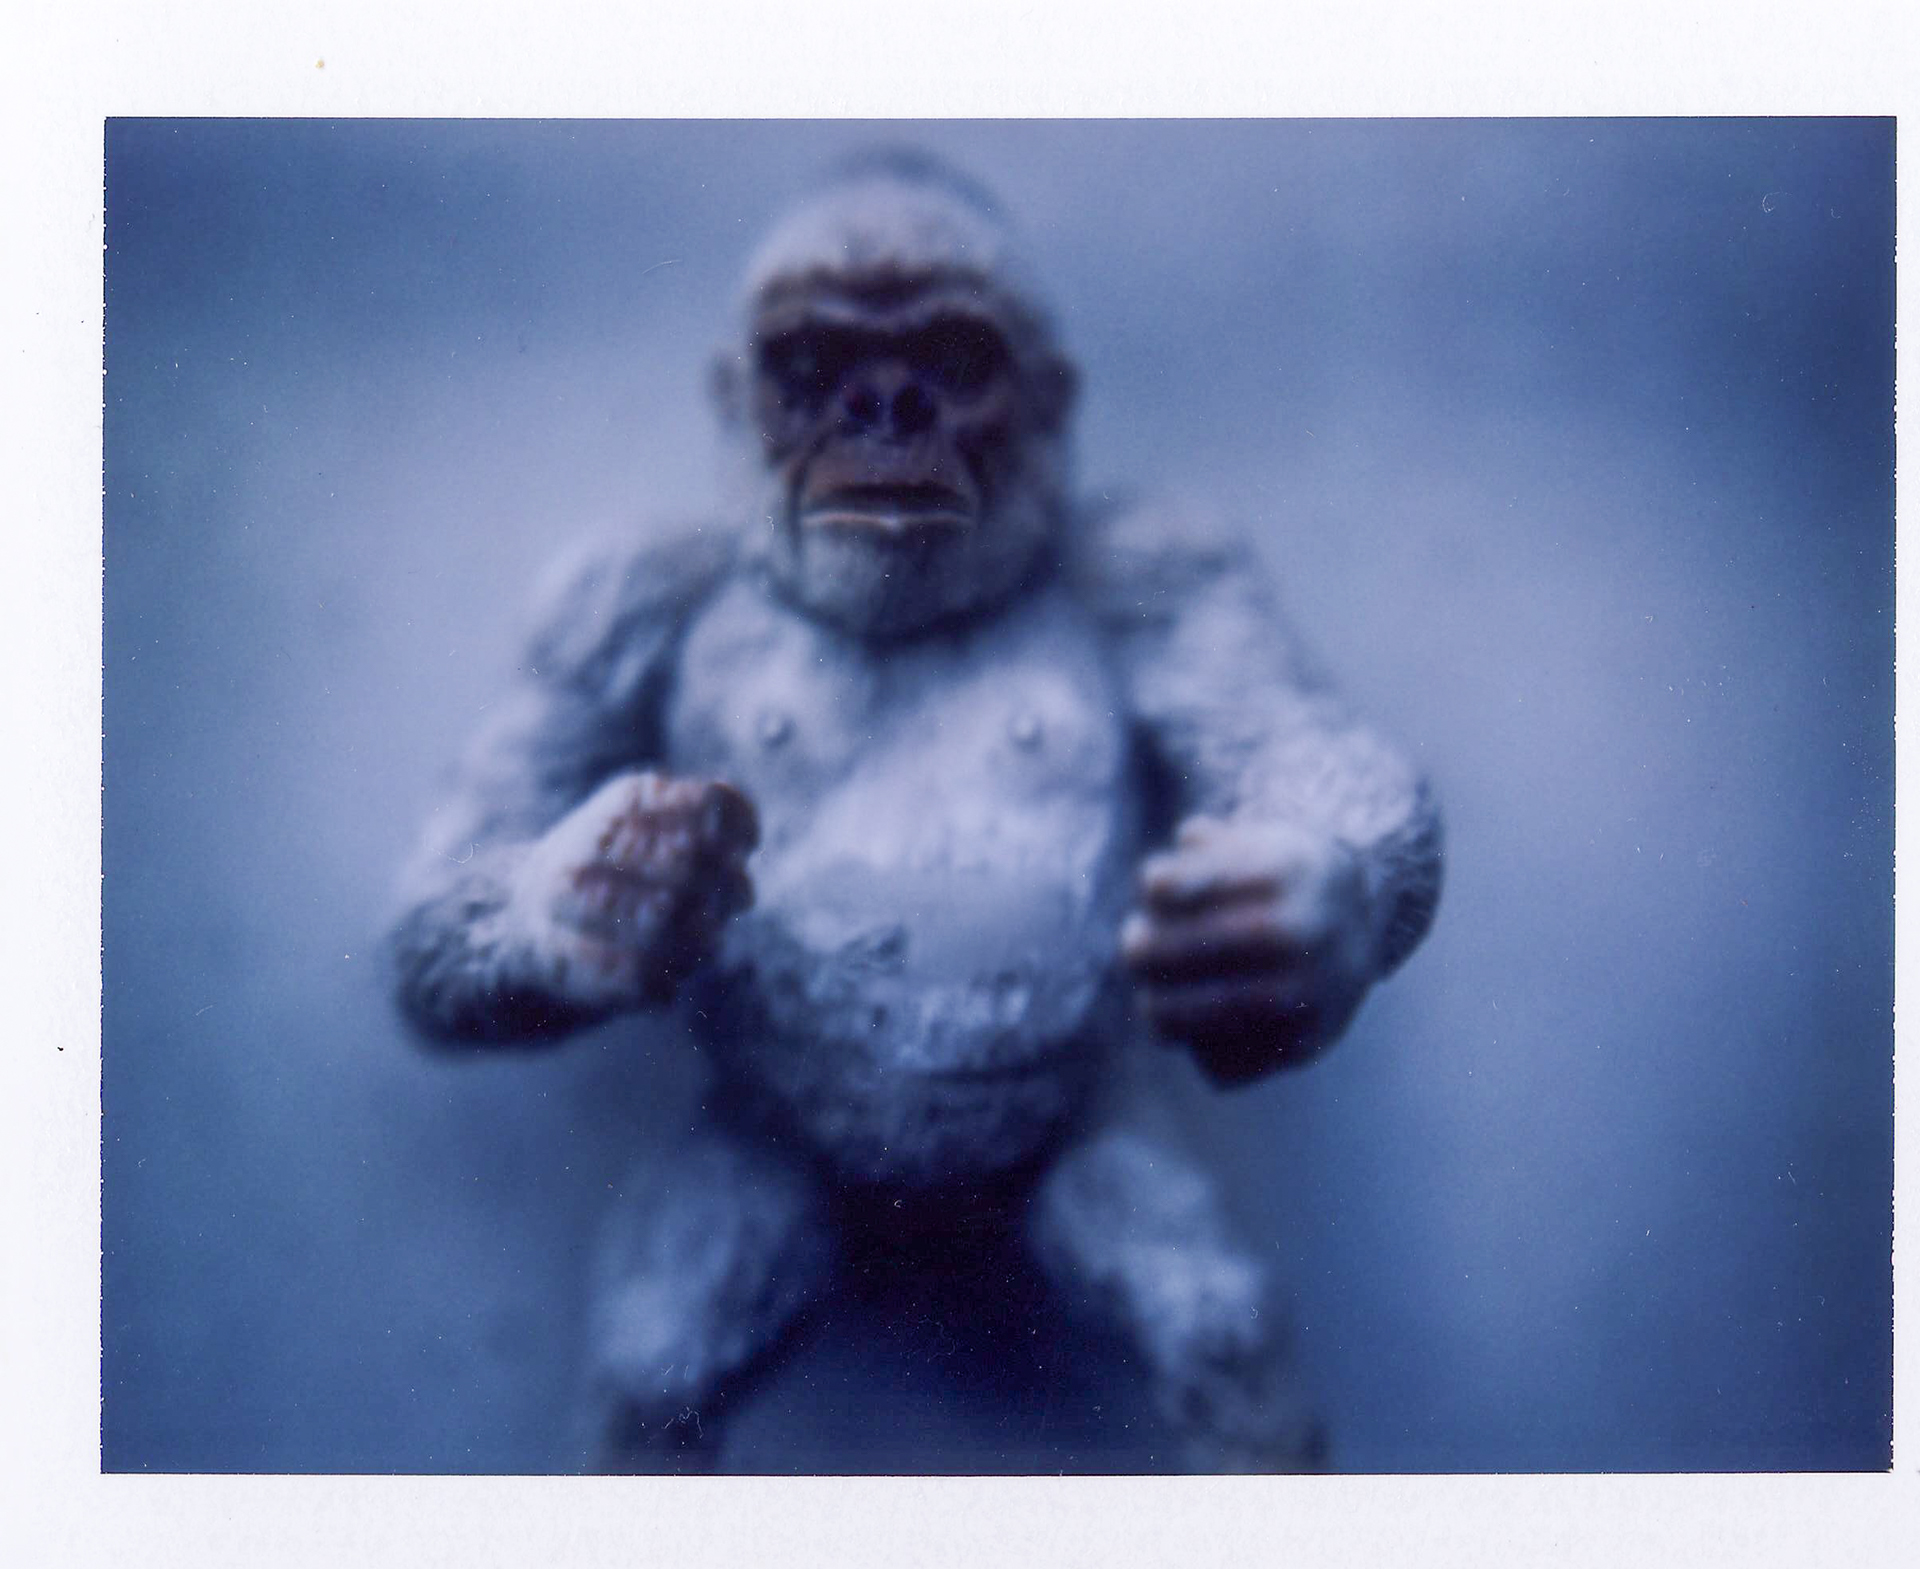 66 Abominable Snowman.jpg